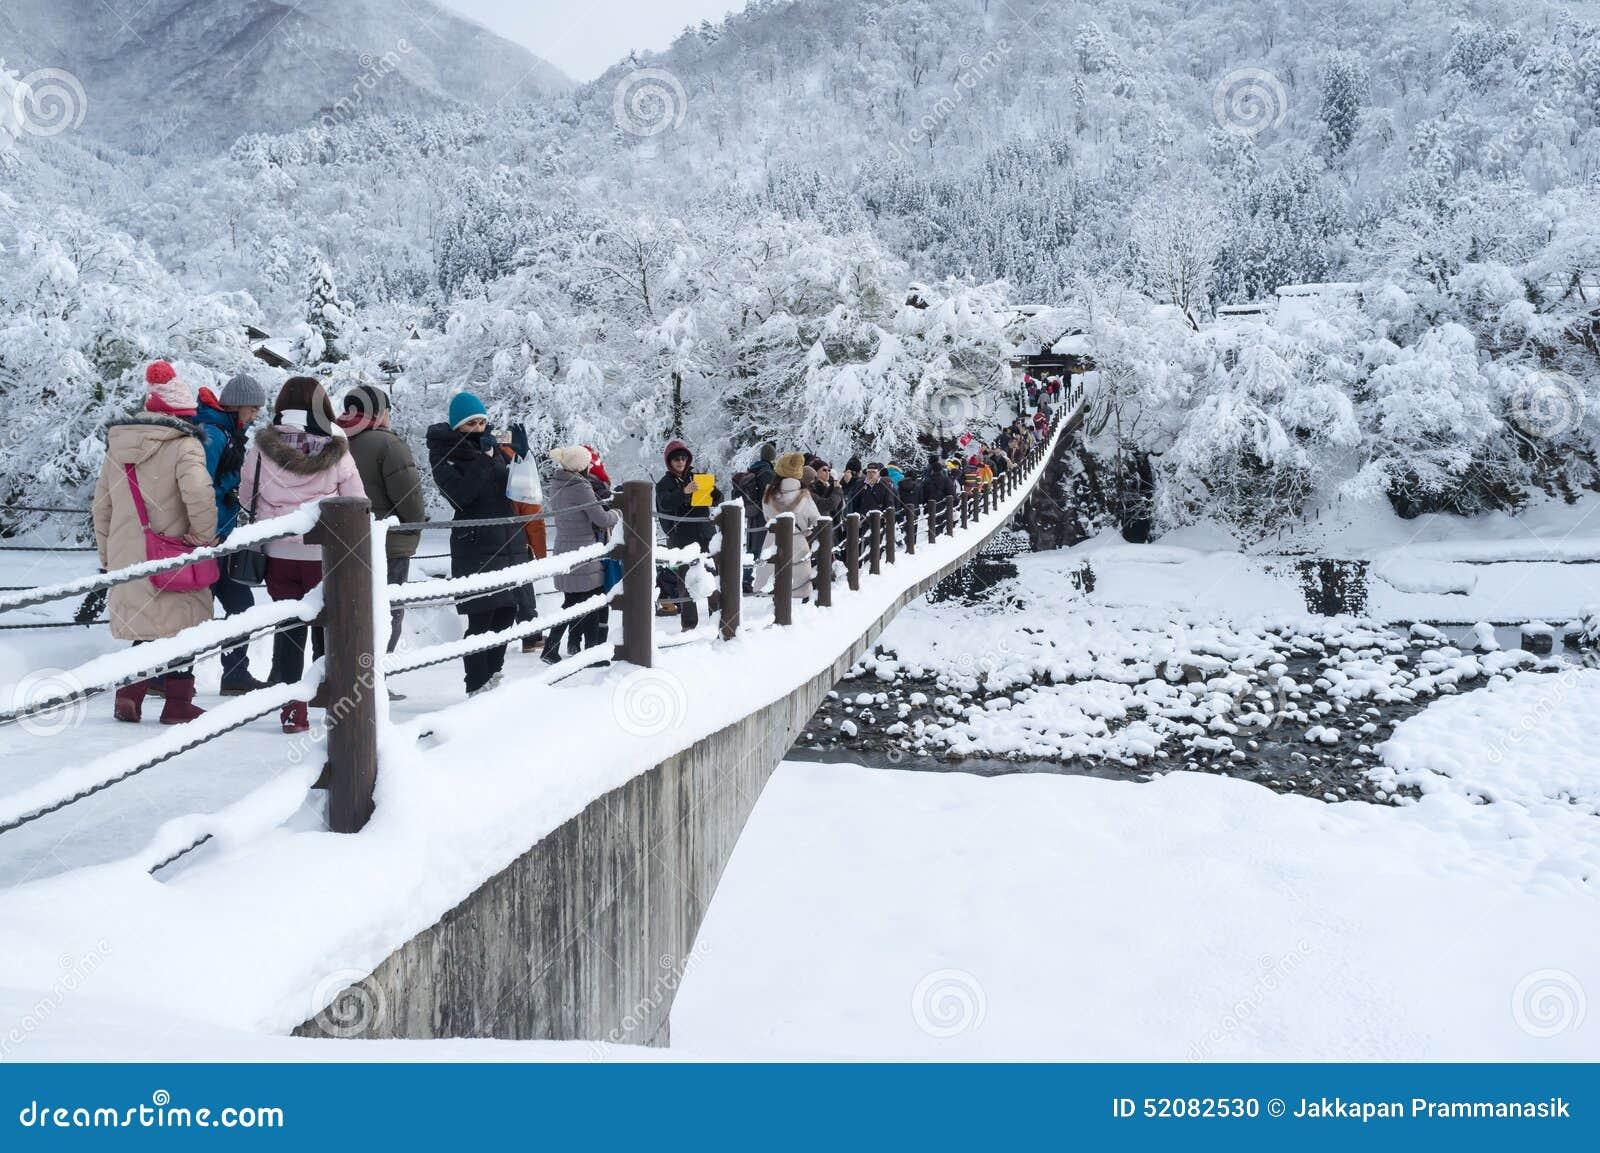 Cold weather season